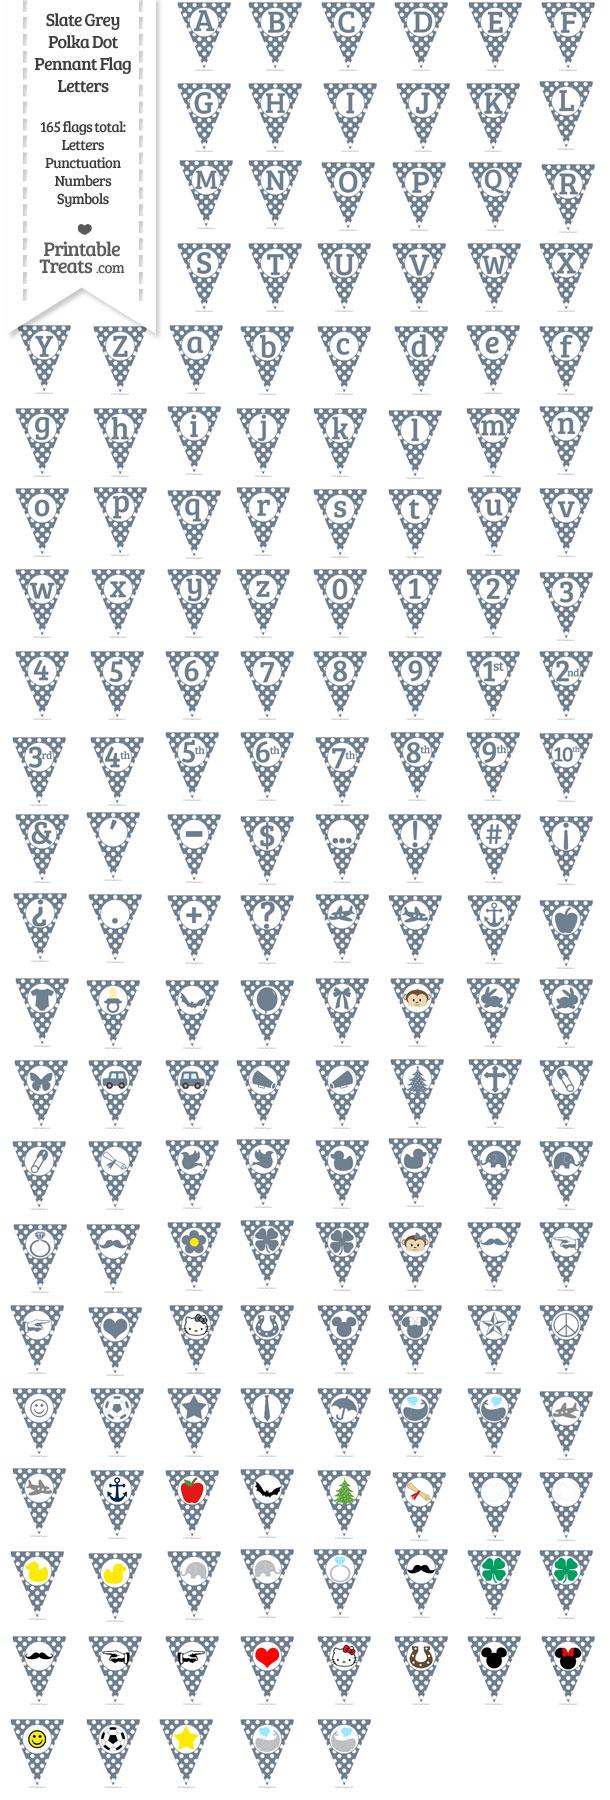 Slate Grey Polka Dot Pennant Flag Letters Download from PrintableTreats.com